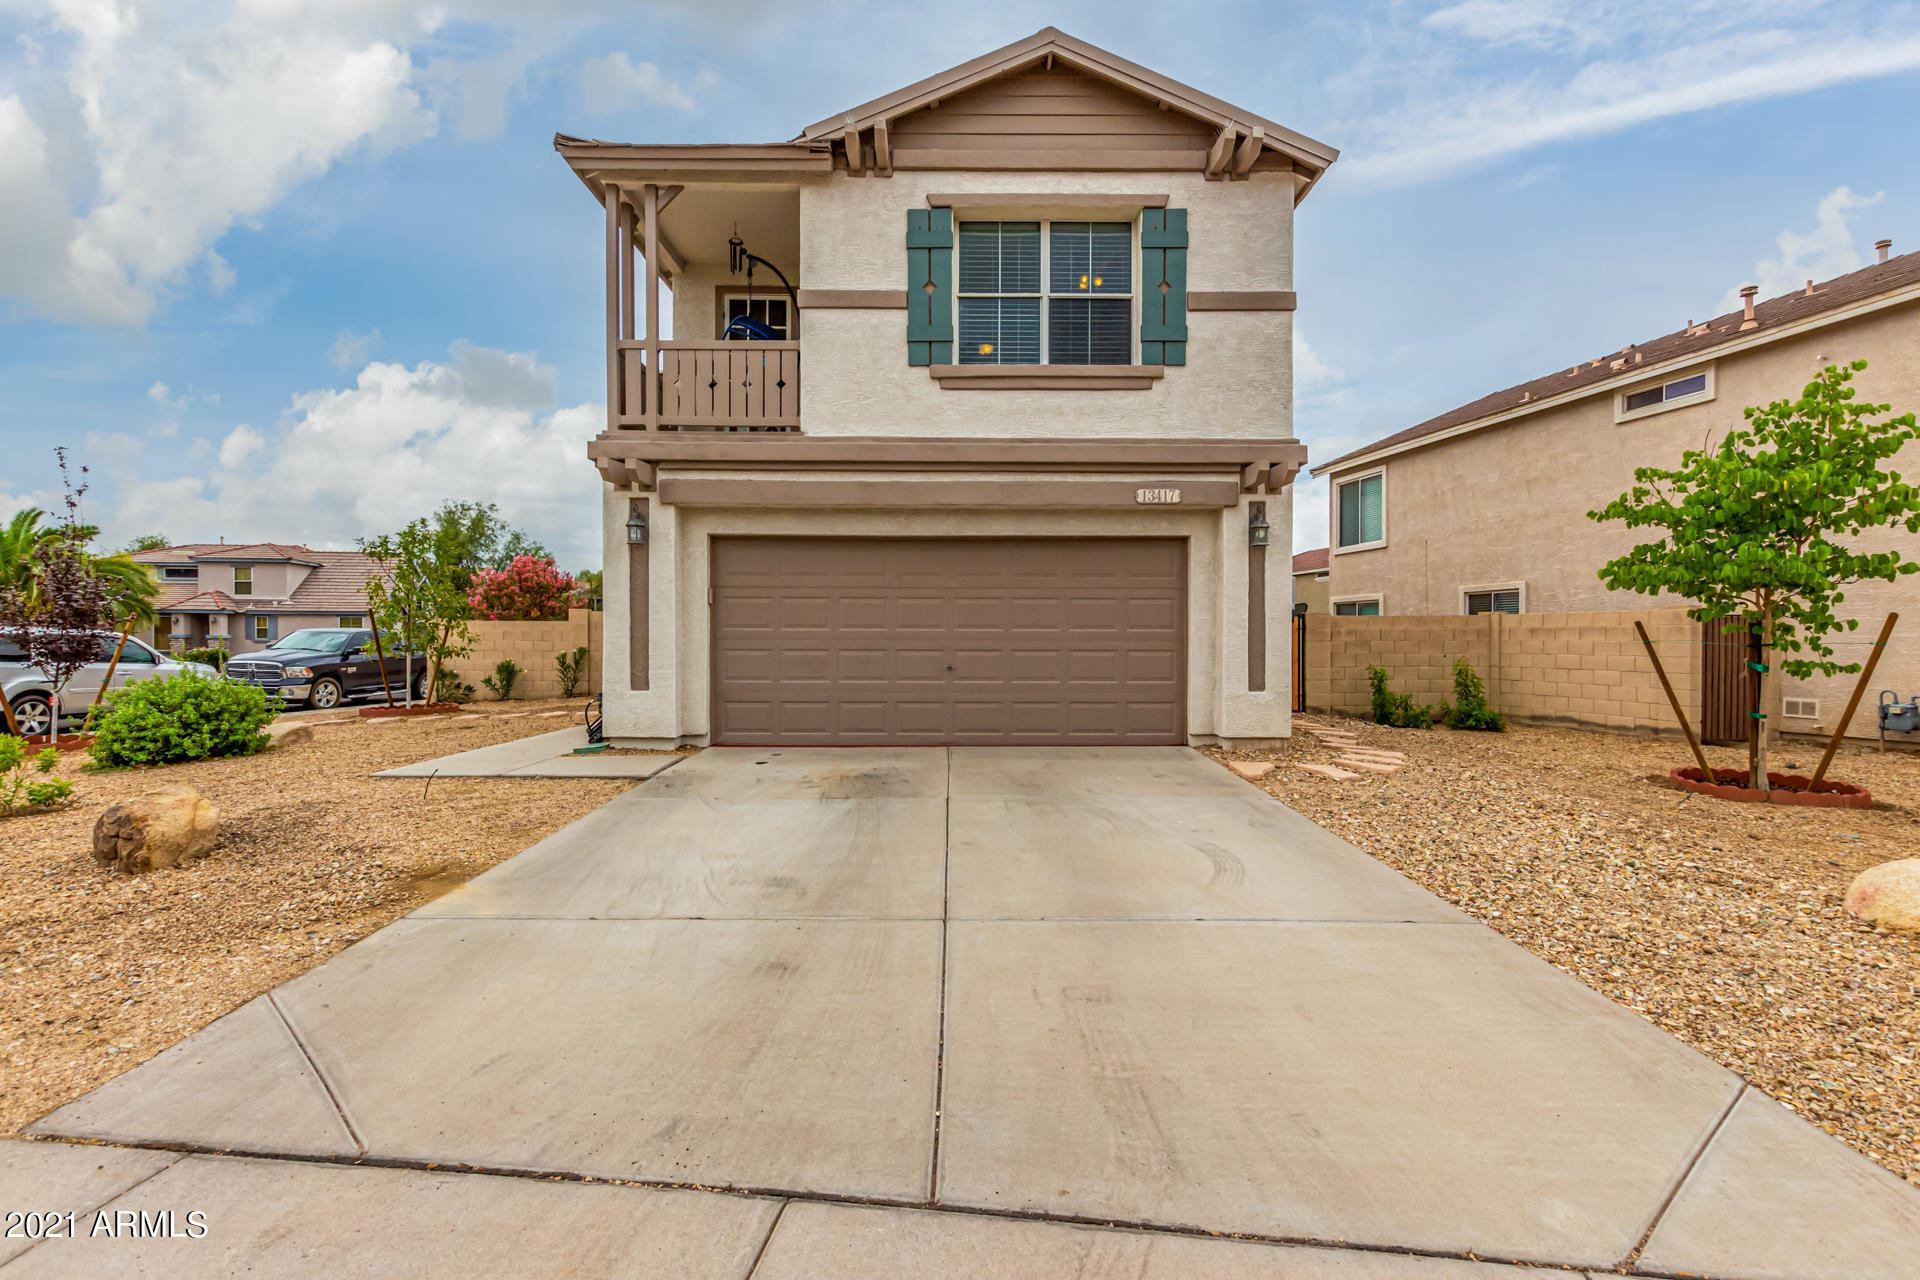 Photo of 13417 W PECK Drive, Litchfield Park, AZ 85340 (MLS # 6270034)